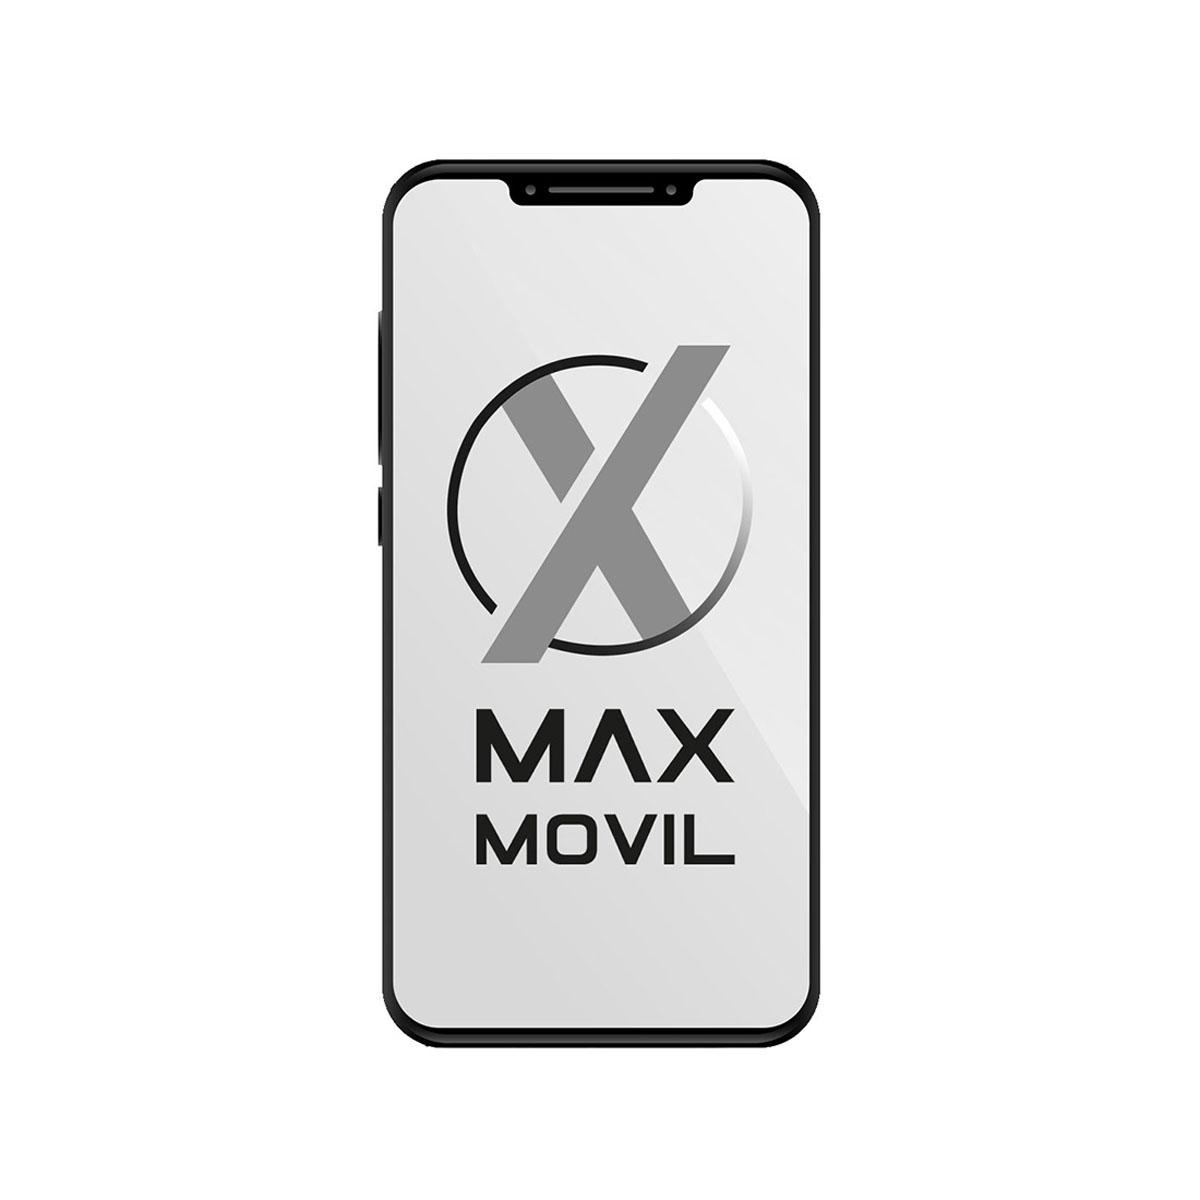 Motorola dock HD ASMHDDOCK para Xoom 2